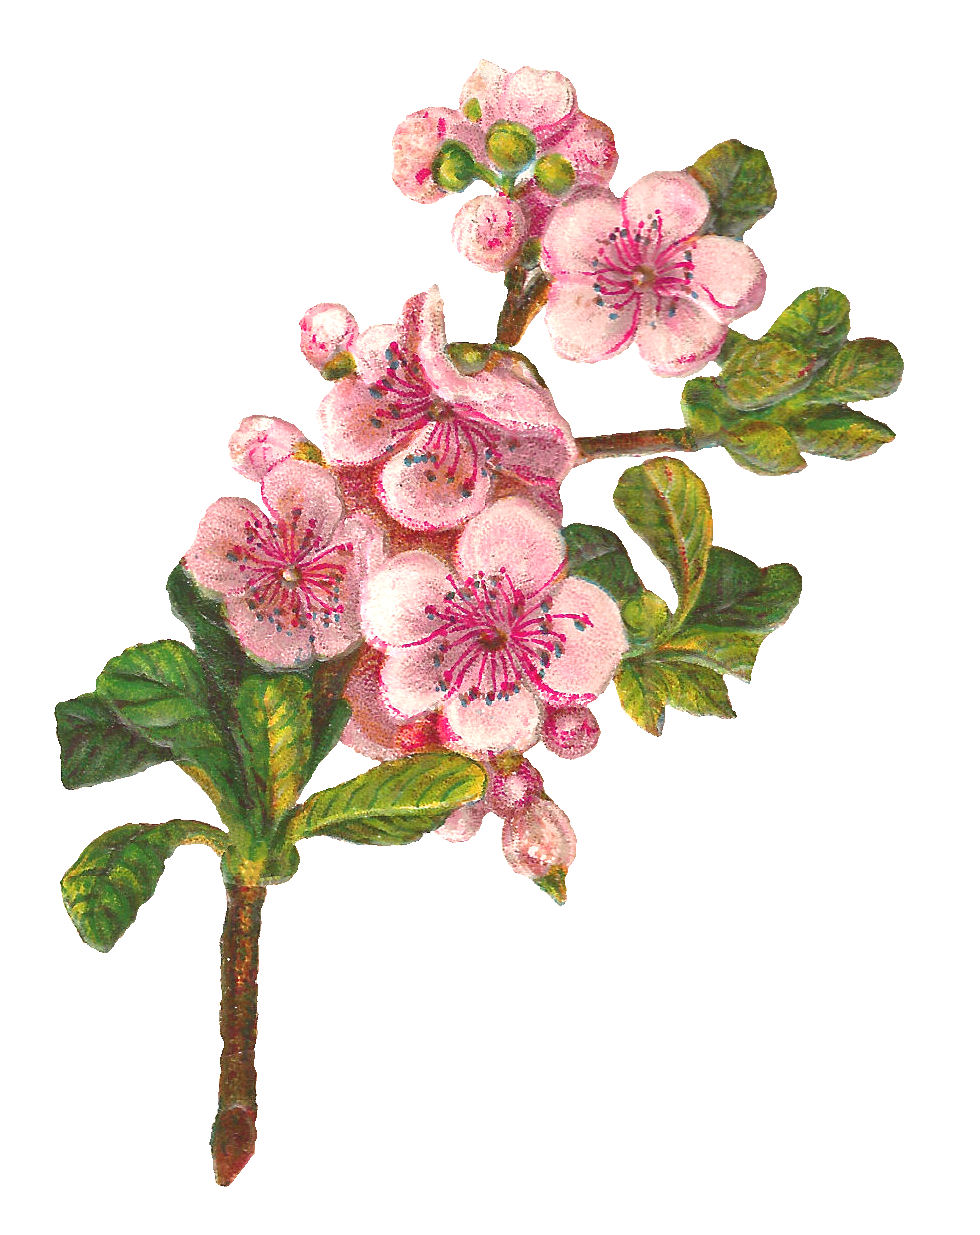 Antique images botanical art apple blossom flower digital for Art flowers